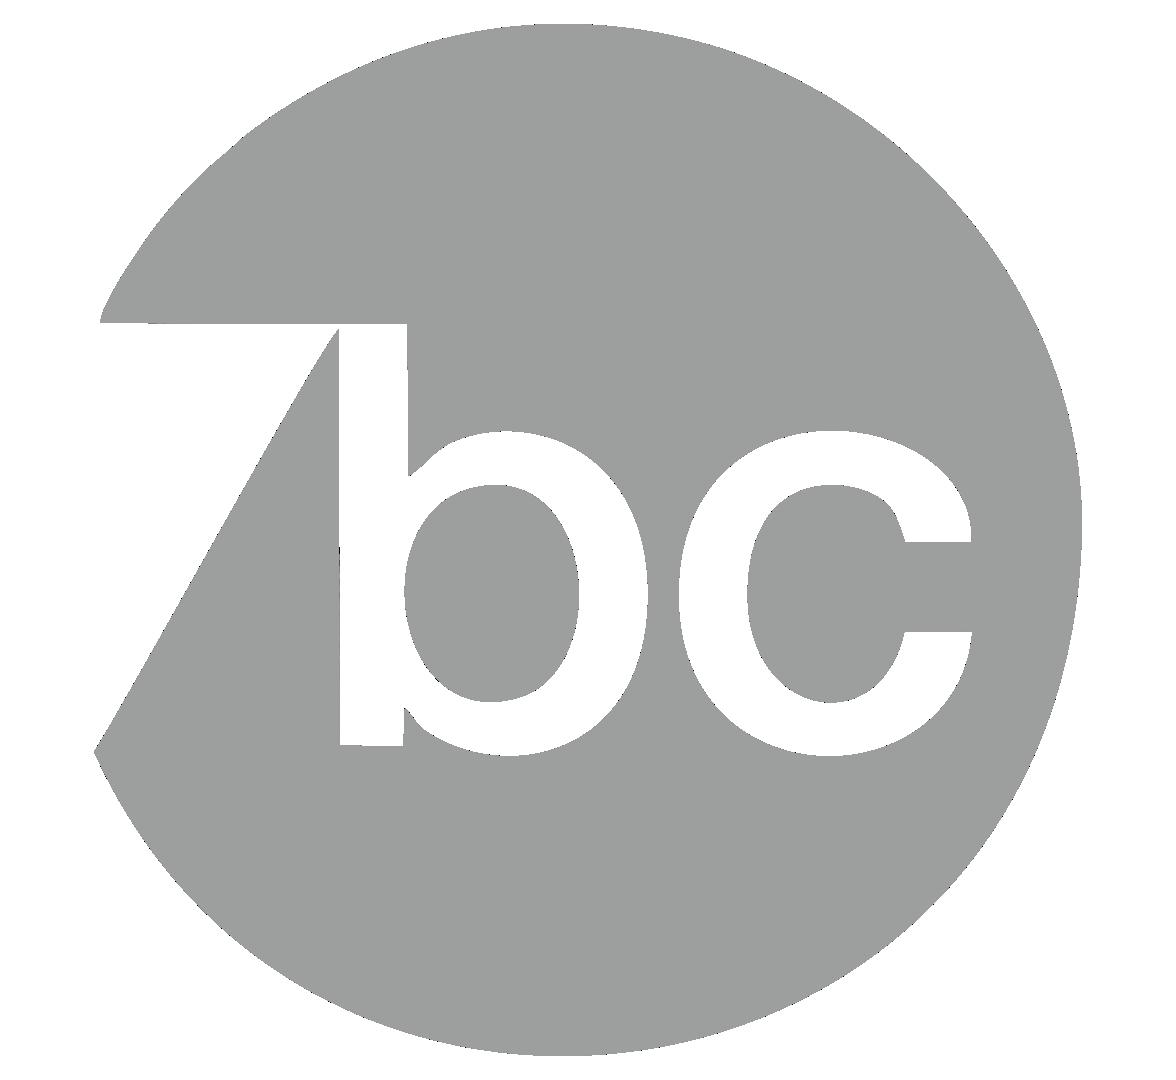 bandcamp logo images - HD1176×1080